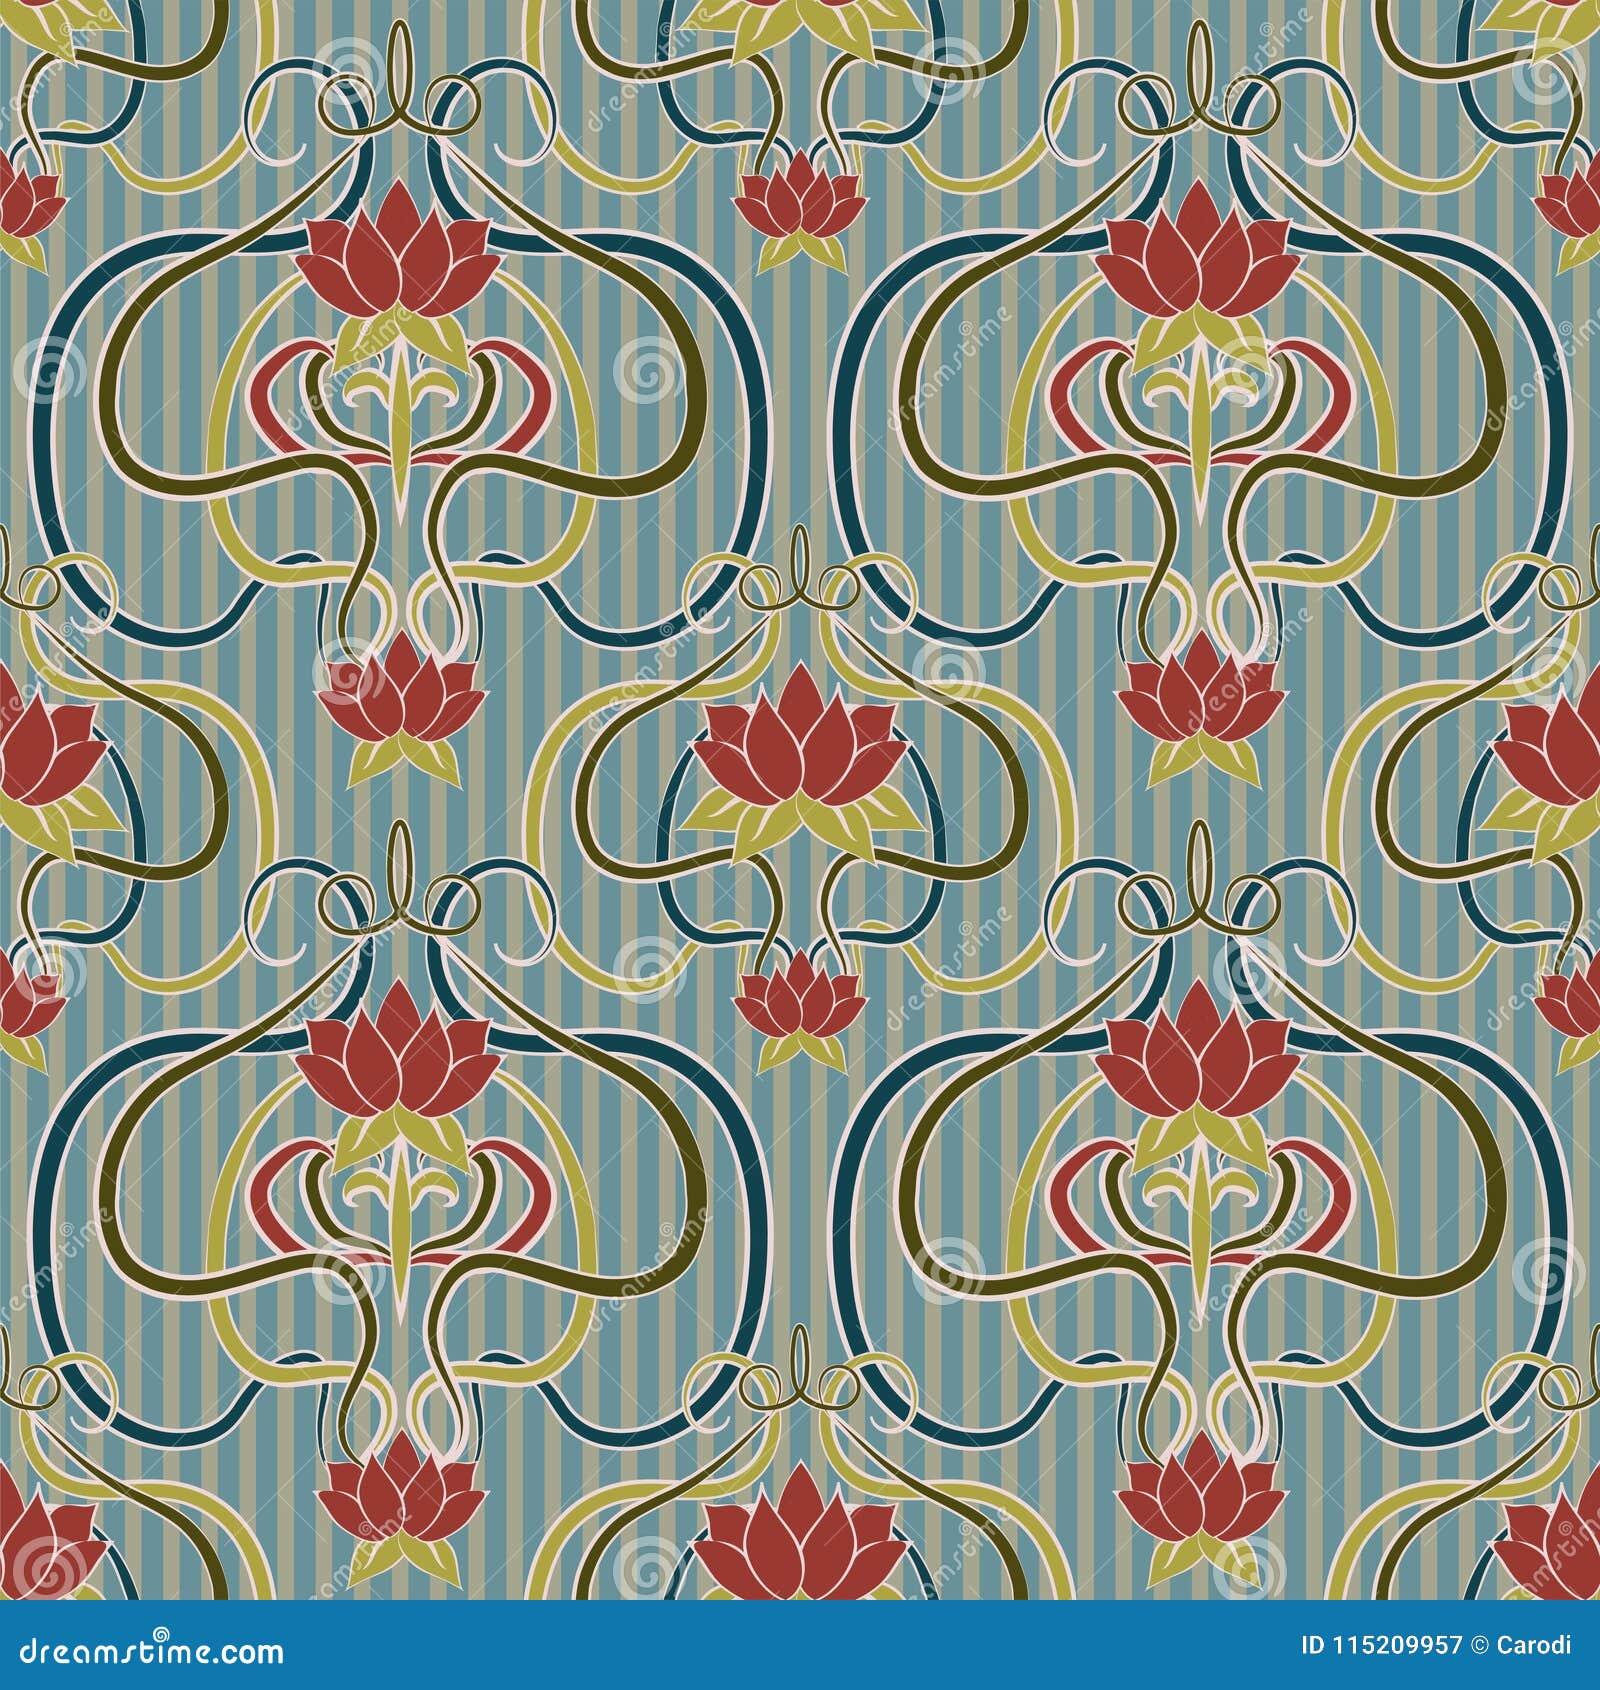 Art Nouveau Carta Da Parati Art Deco.Floral Seamless Wallpaper In Art Nouveau Style Vector Stock